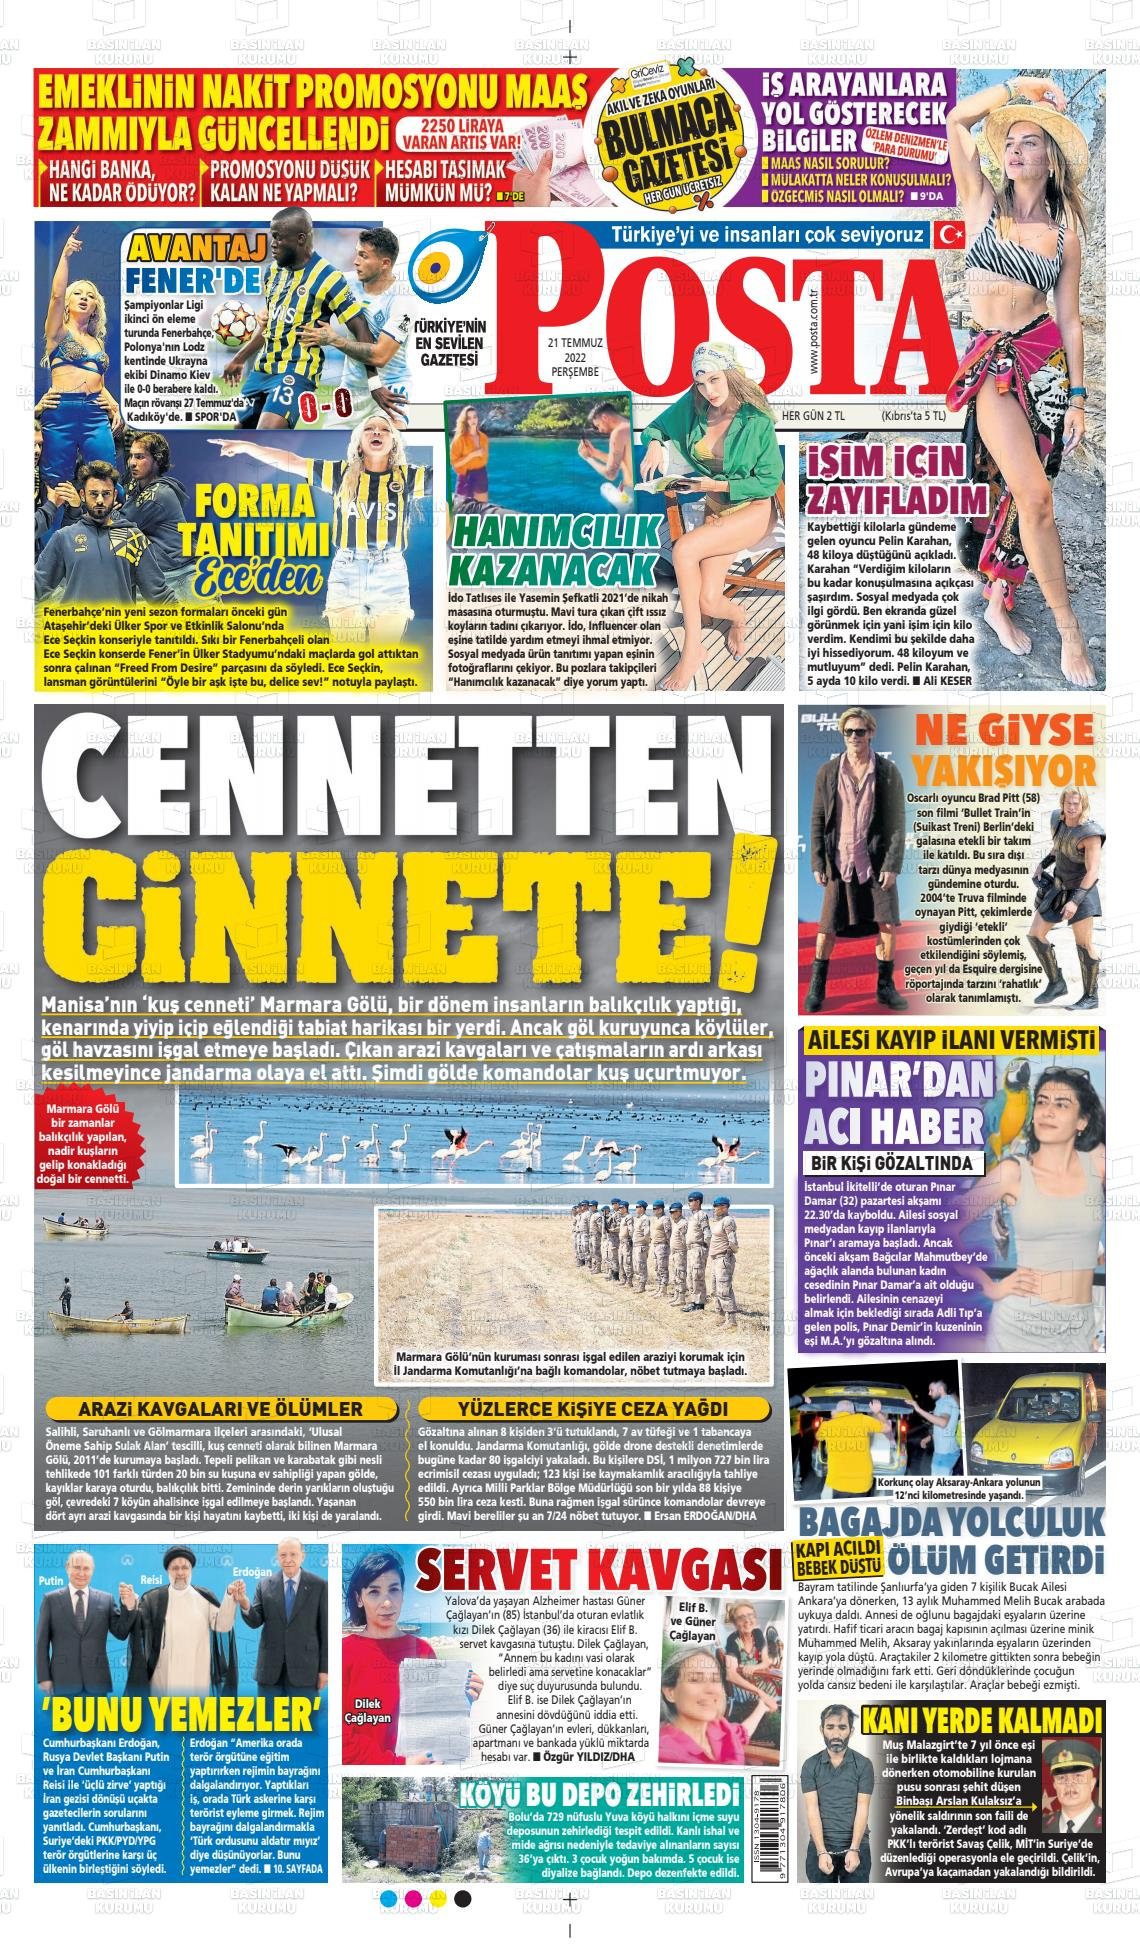 18 Eylül 2020, Cuma posta Gazetesi